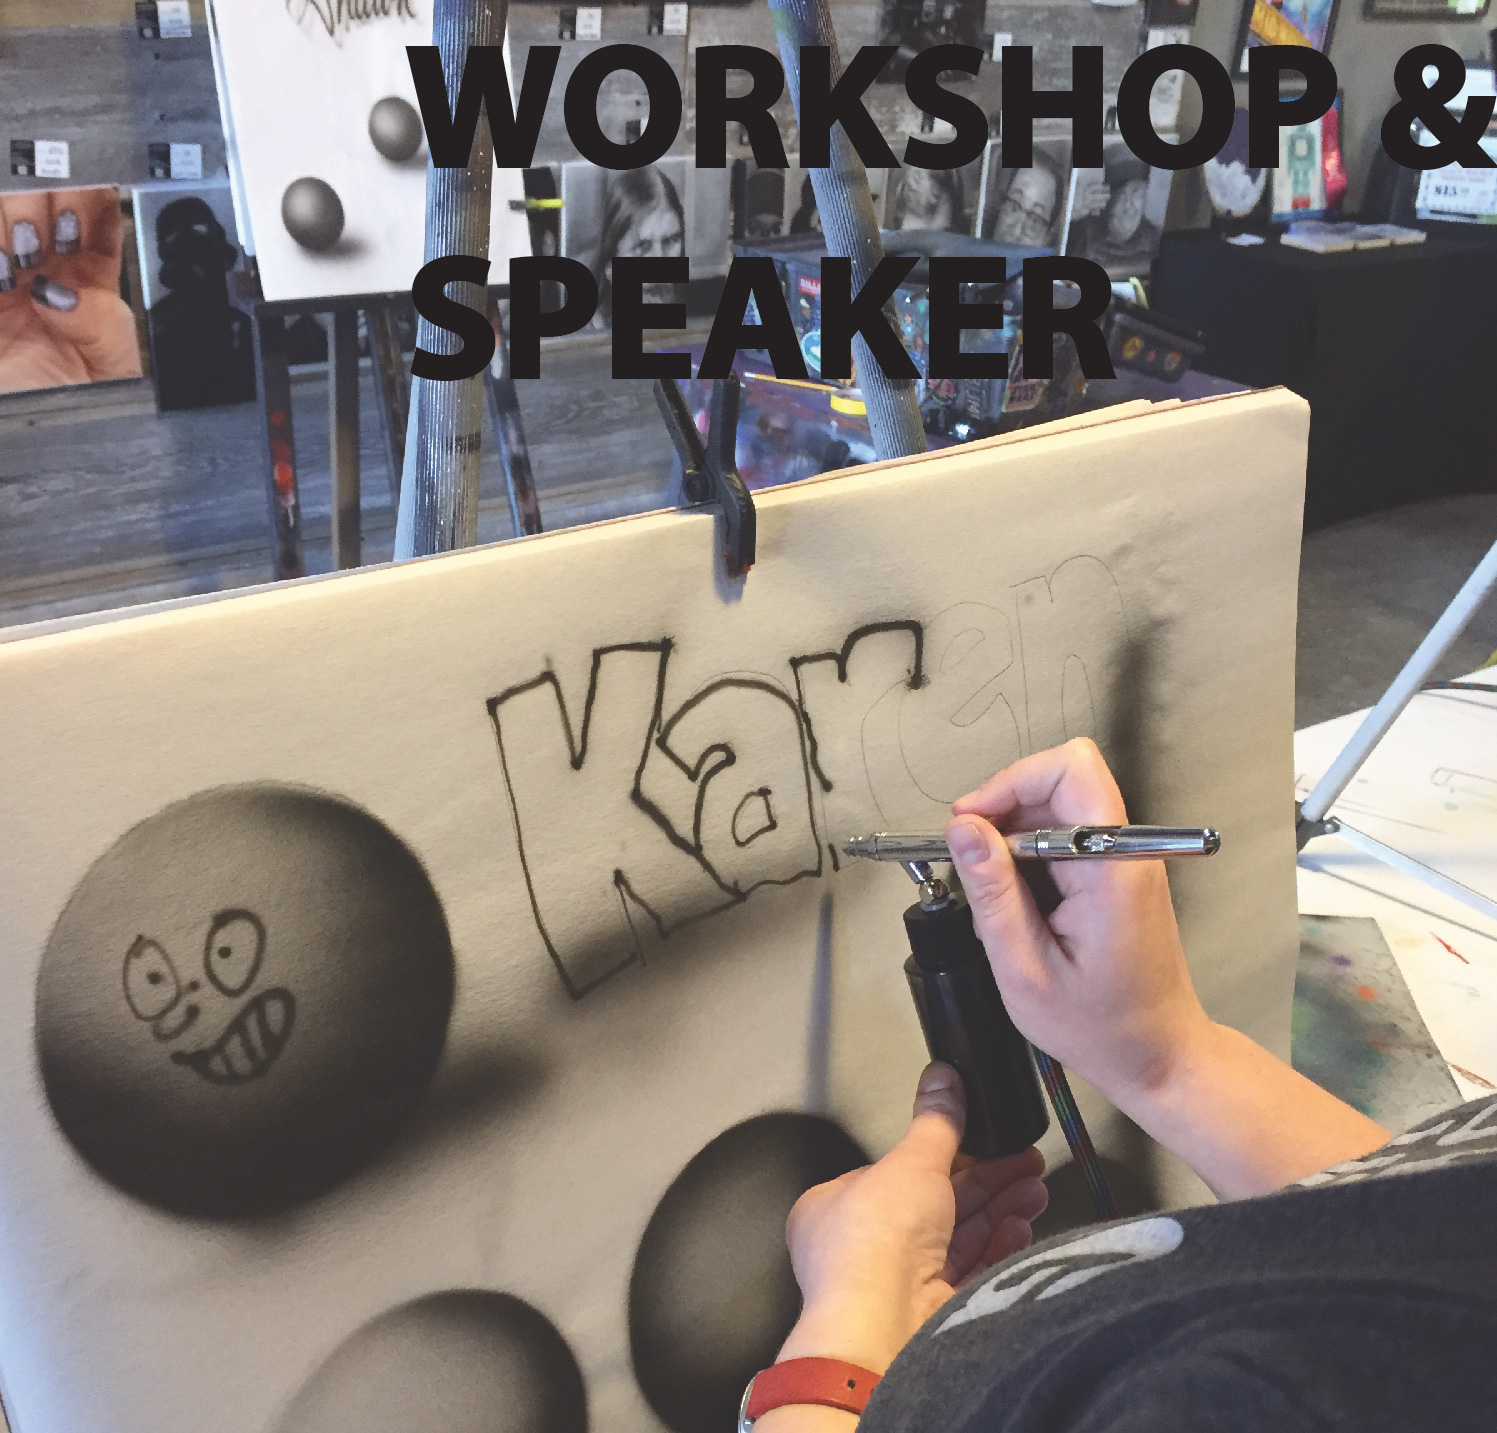 Workshops & Public Speaking